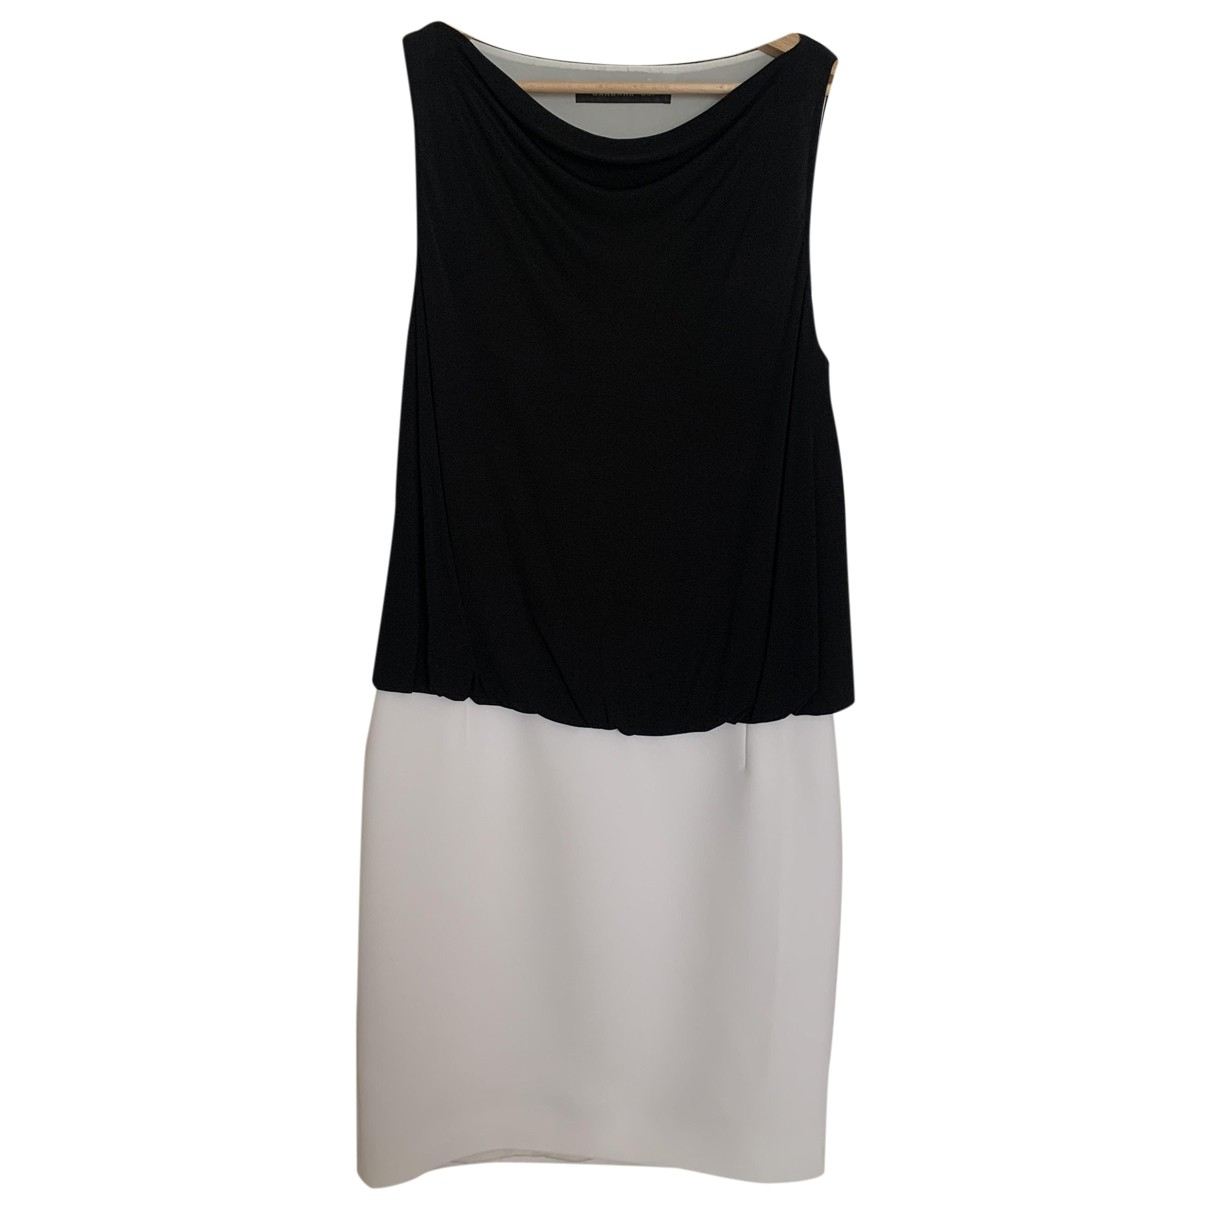 Barbara Bui \N White dress for Women 36 FR